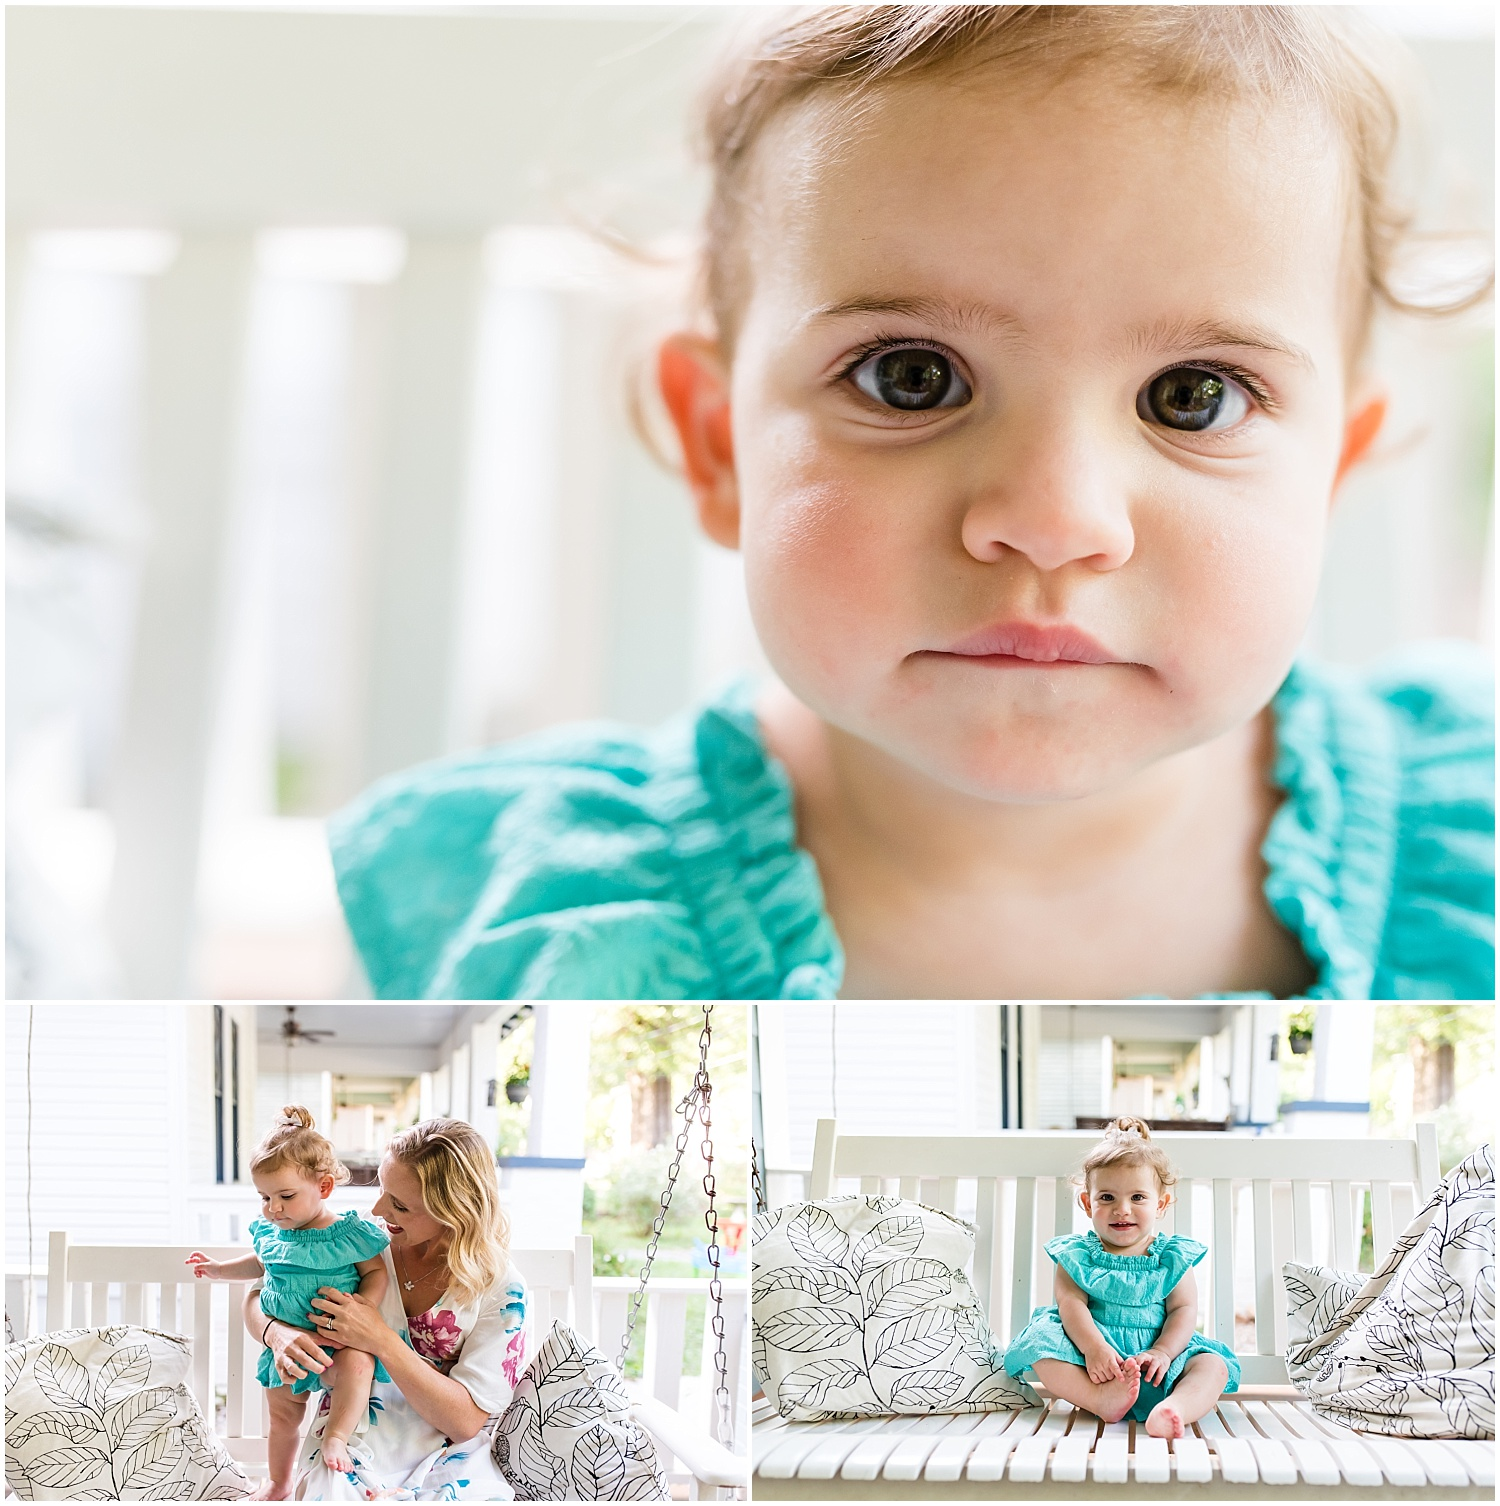 kirkwood-atlanta-family-session-tabitha-maegan-photography (3).jpg